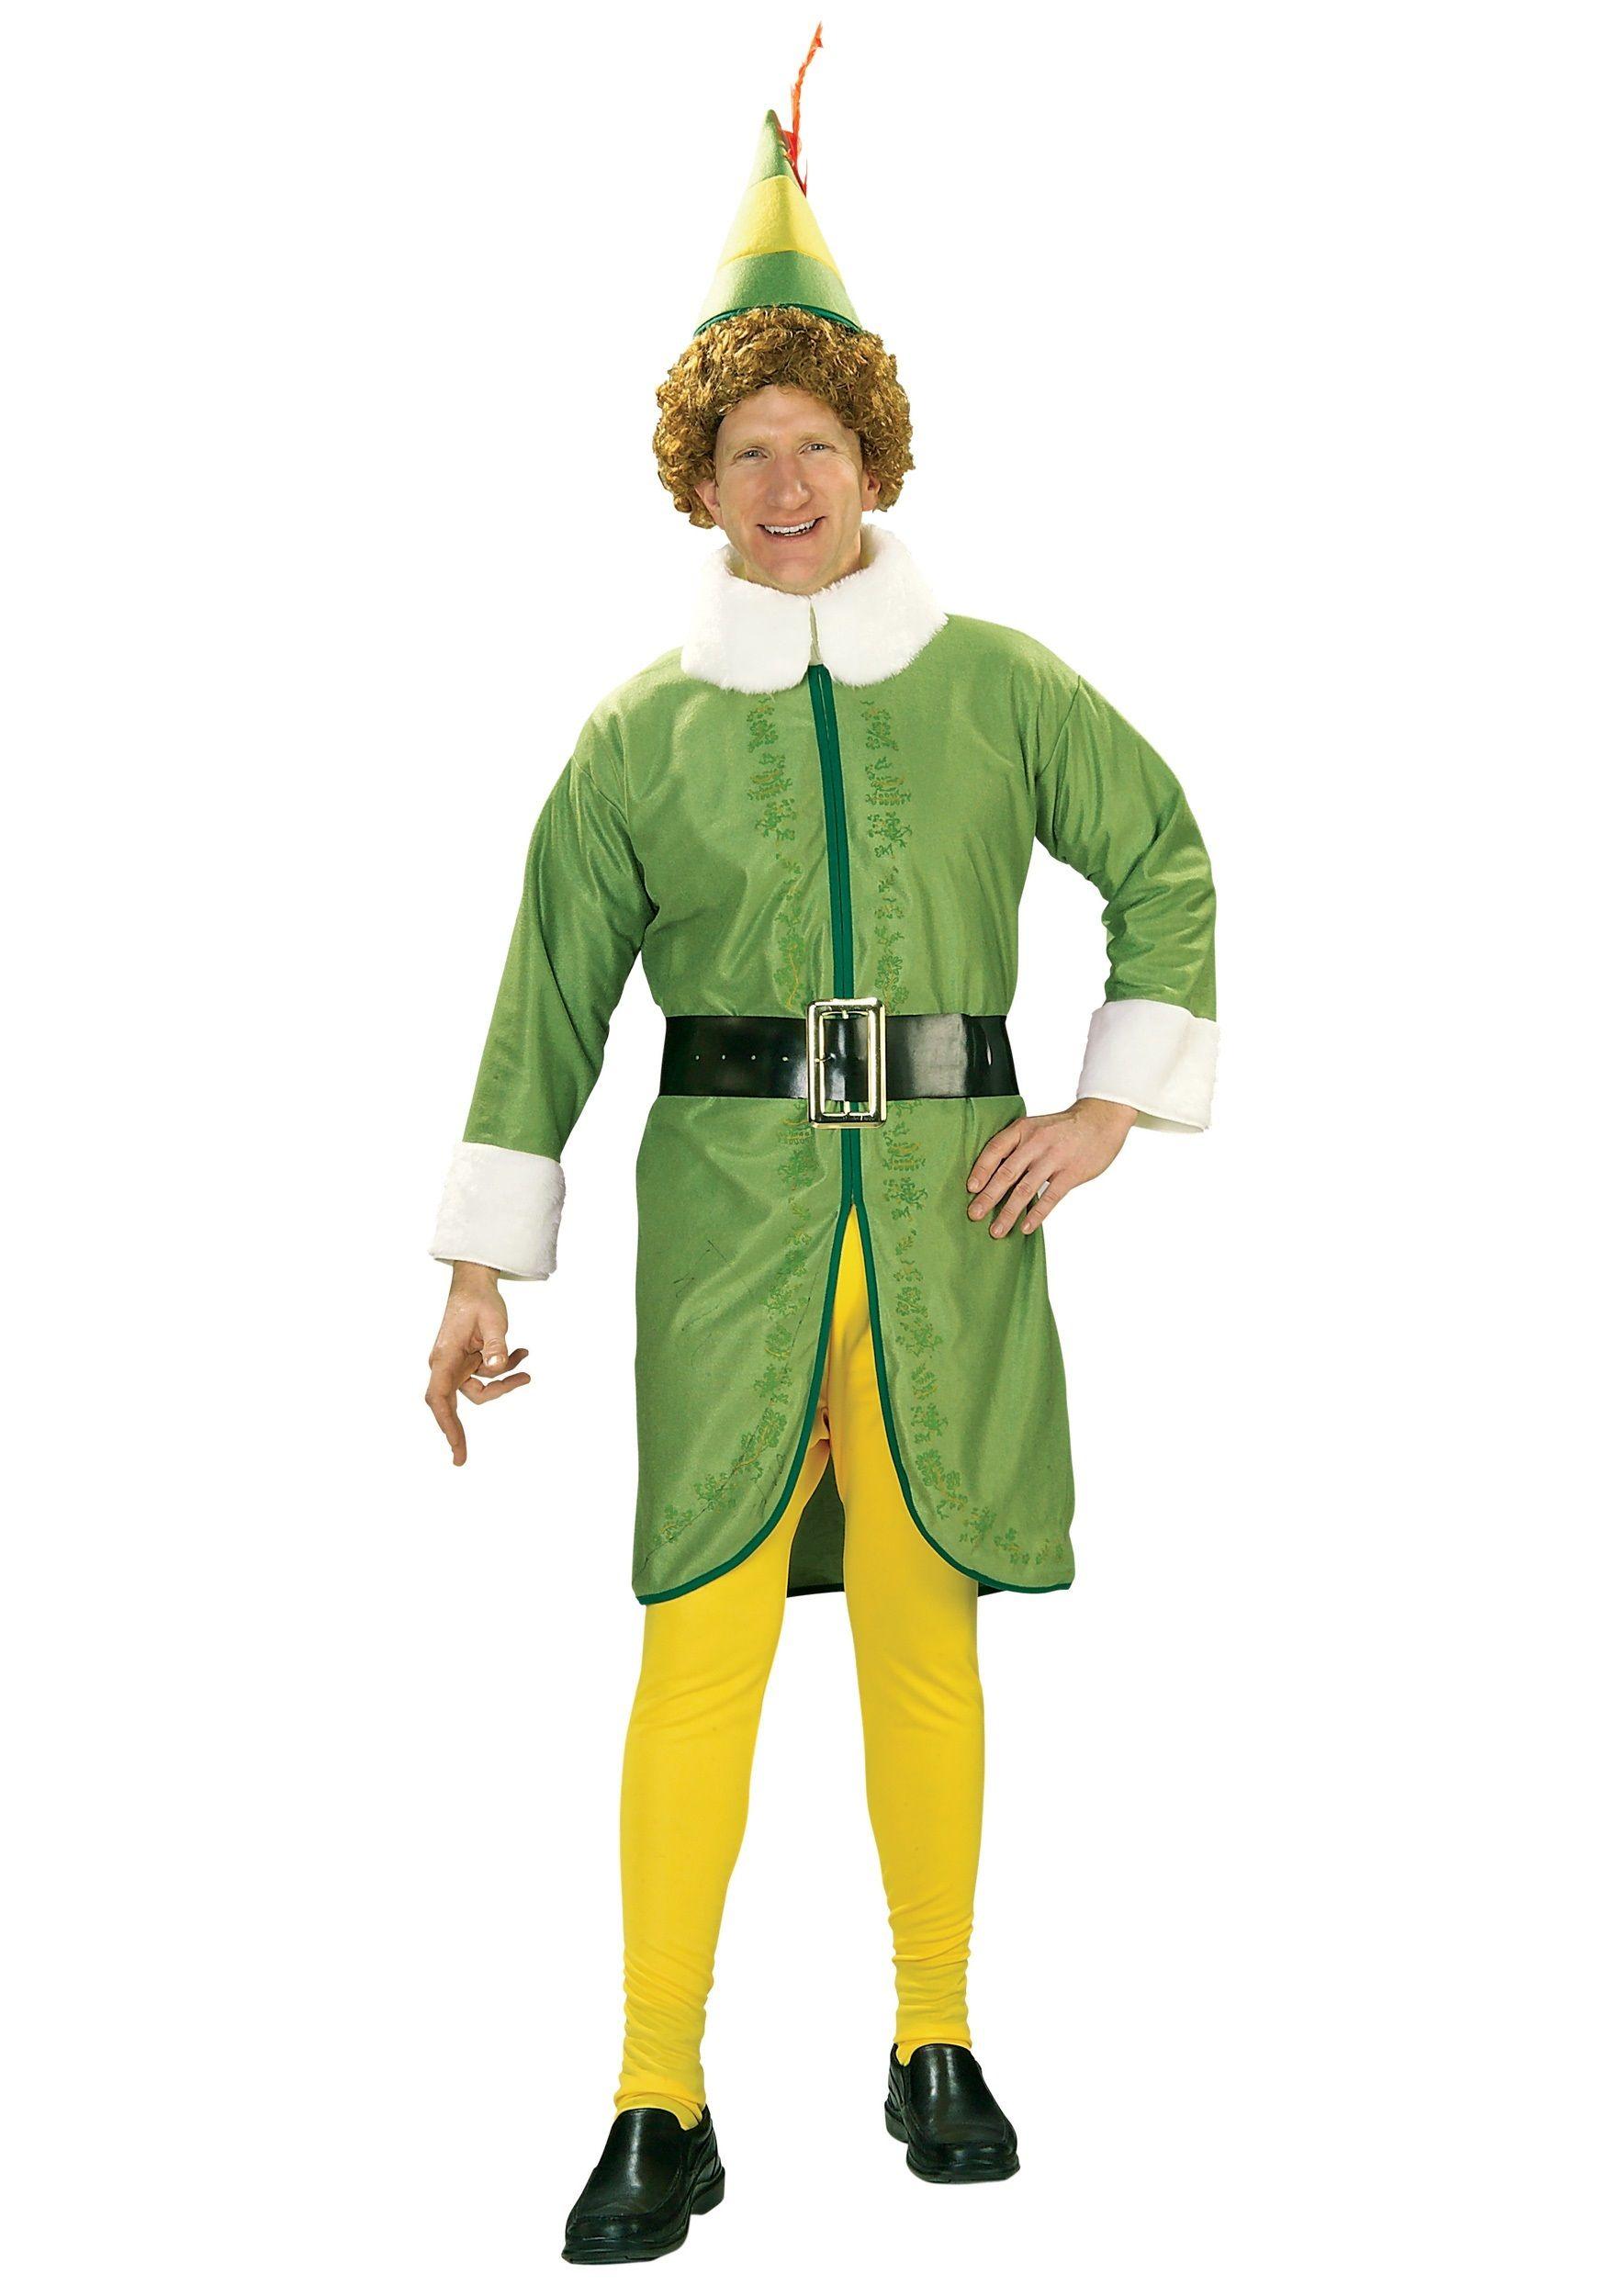 Plus Size Buddy The Elf Costume Buddy The Elf Costume Buddy The Elf Elf Costume